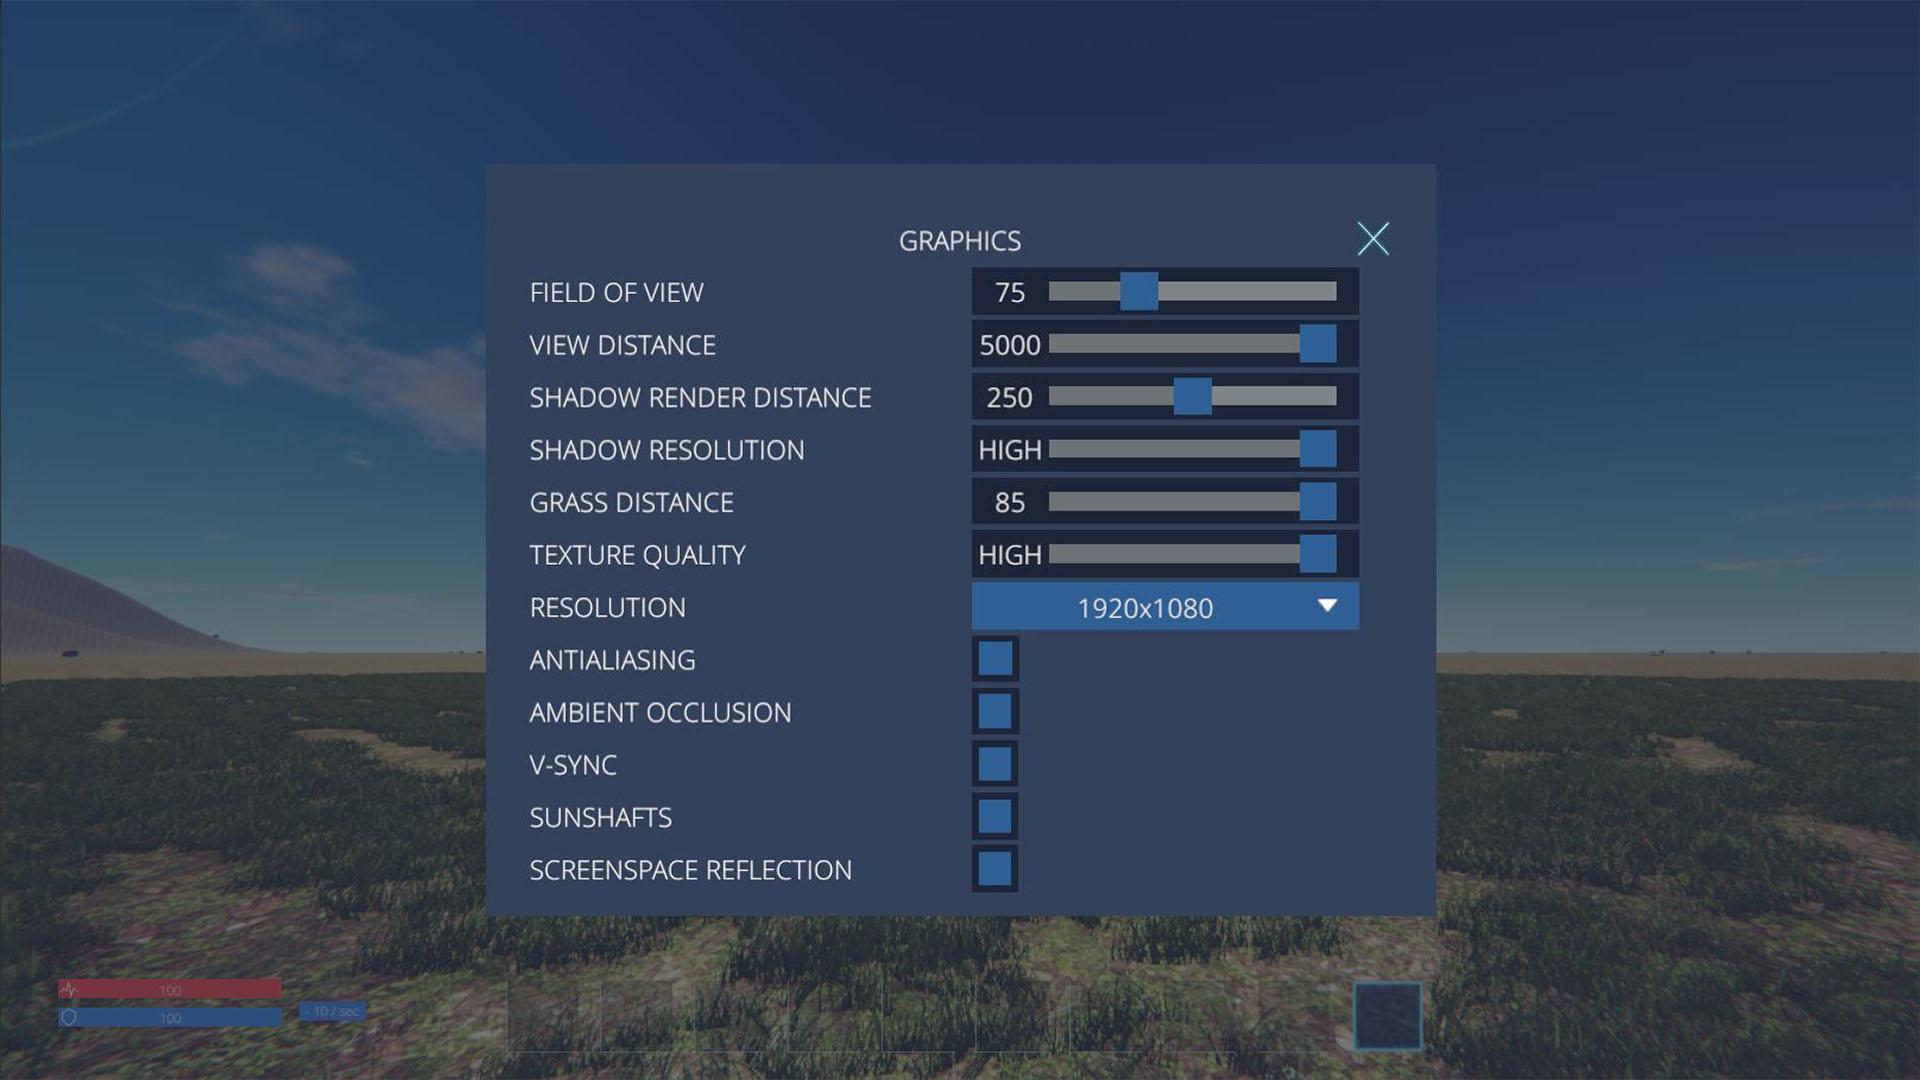 GraphicsScreen